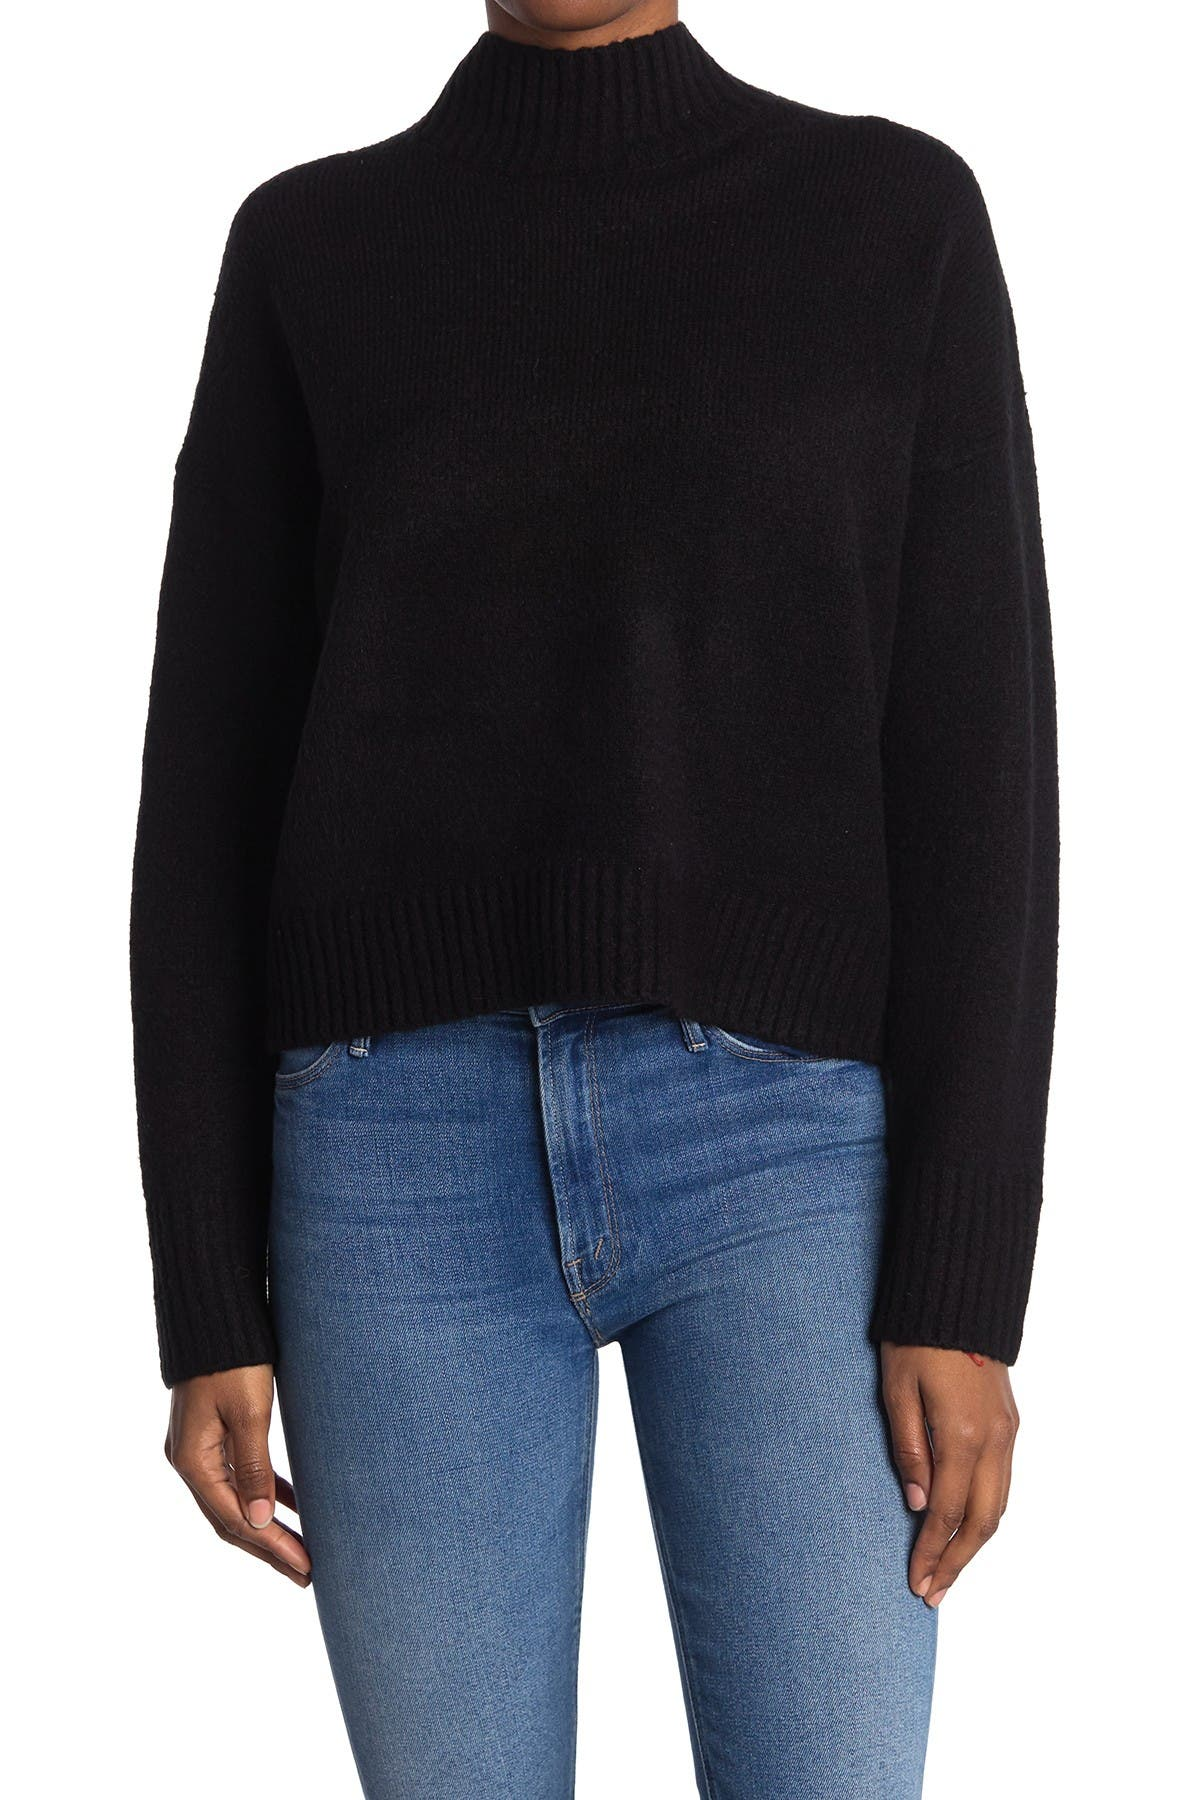 Image of Double Zero Straight Fit Mock Neck Sweater